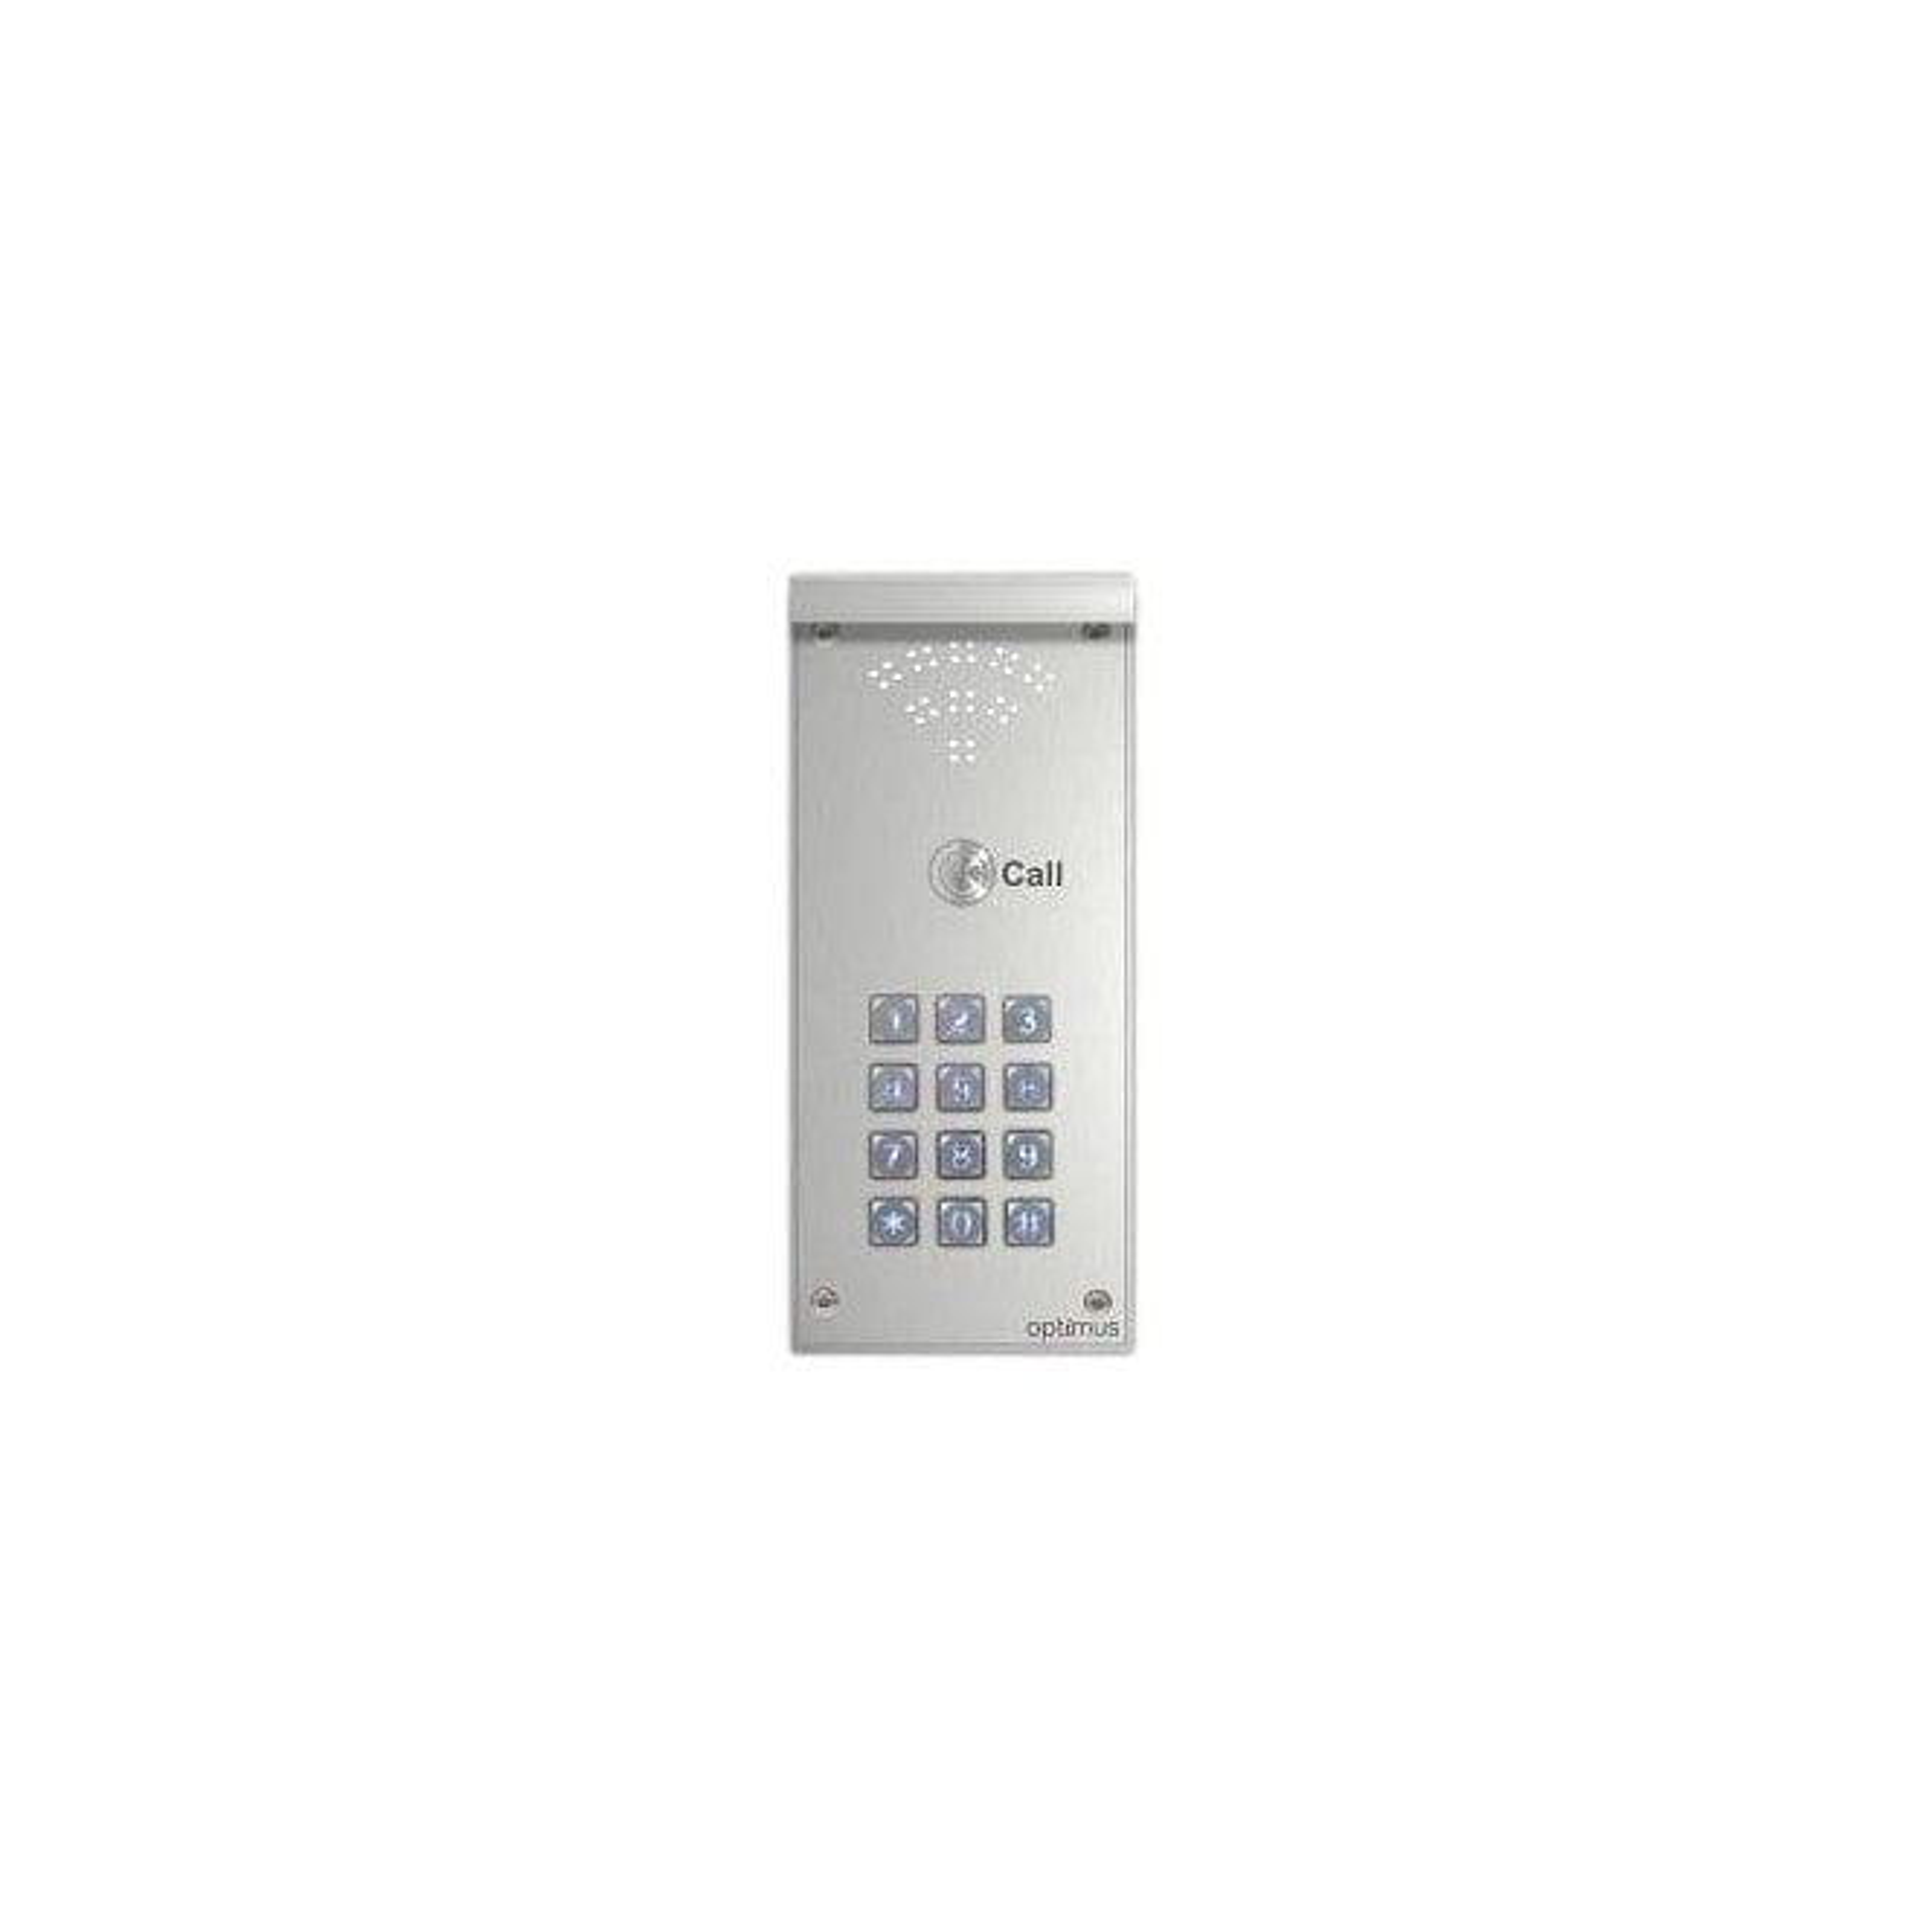 Telguard Optimus Door Entry by Telguard - Single Call Button and Illuminated Keypad